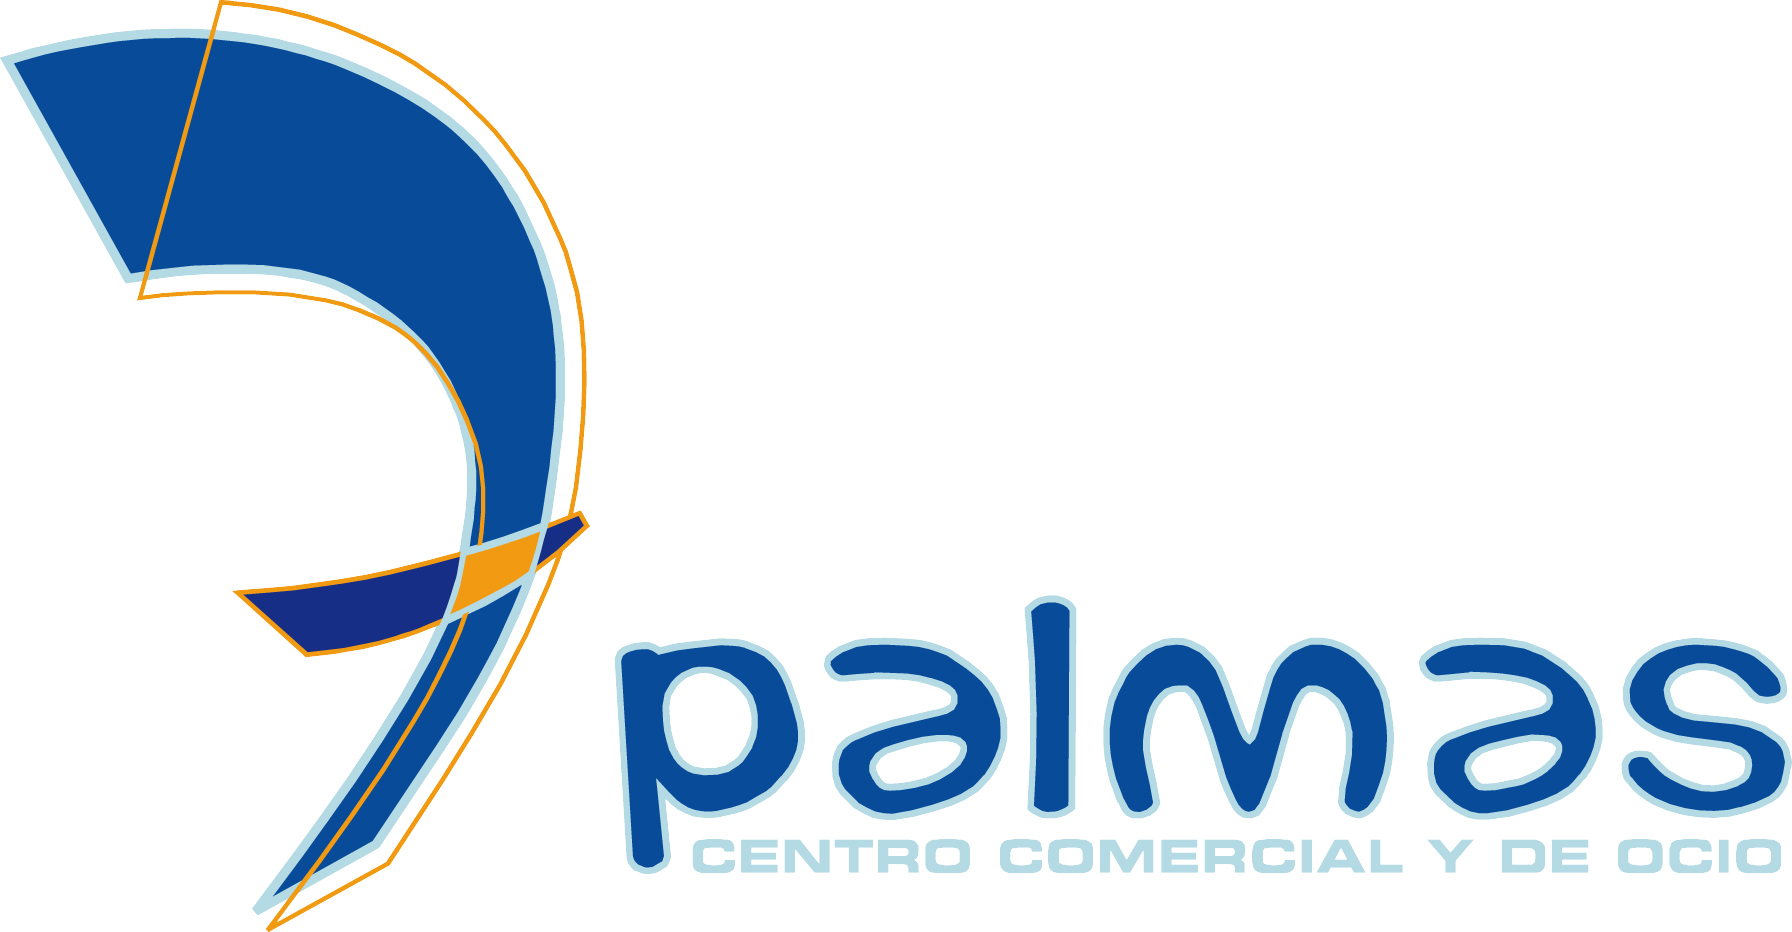 Actividades realizadas para el Centro Comercial 7 Palmas